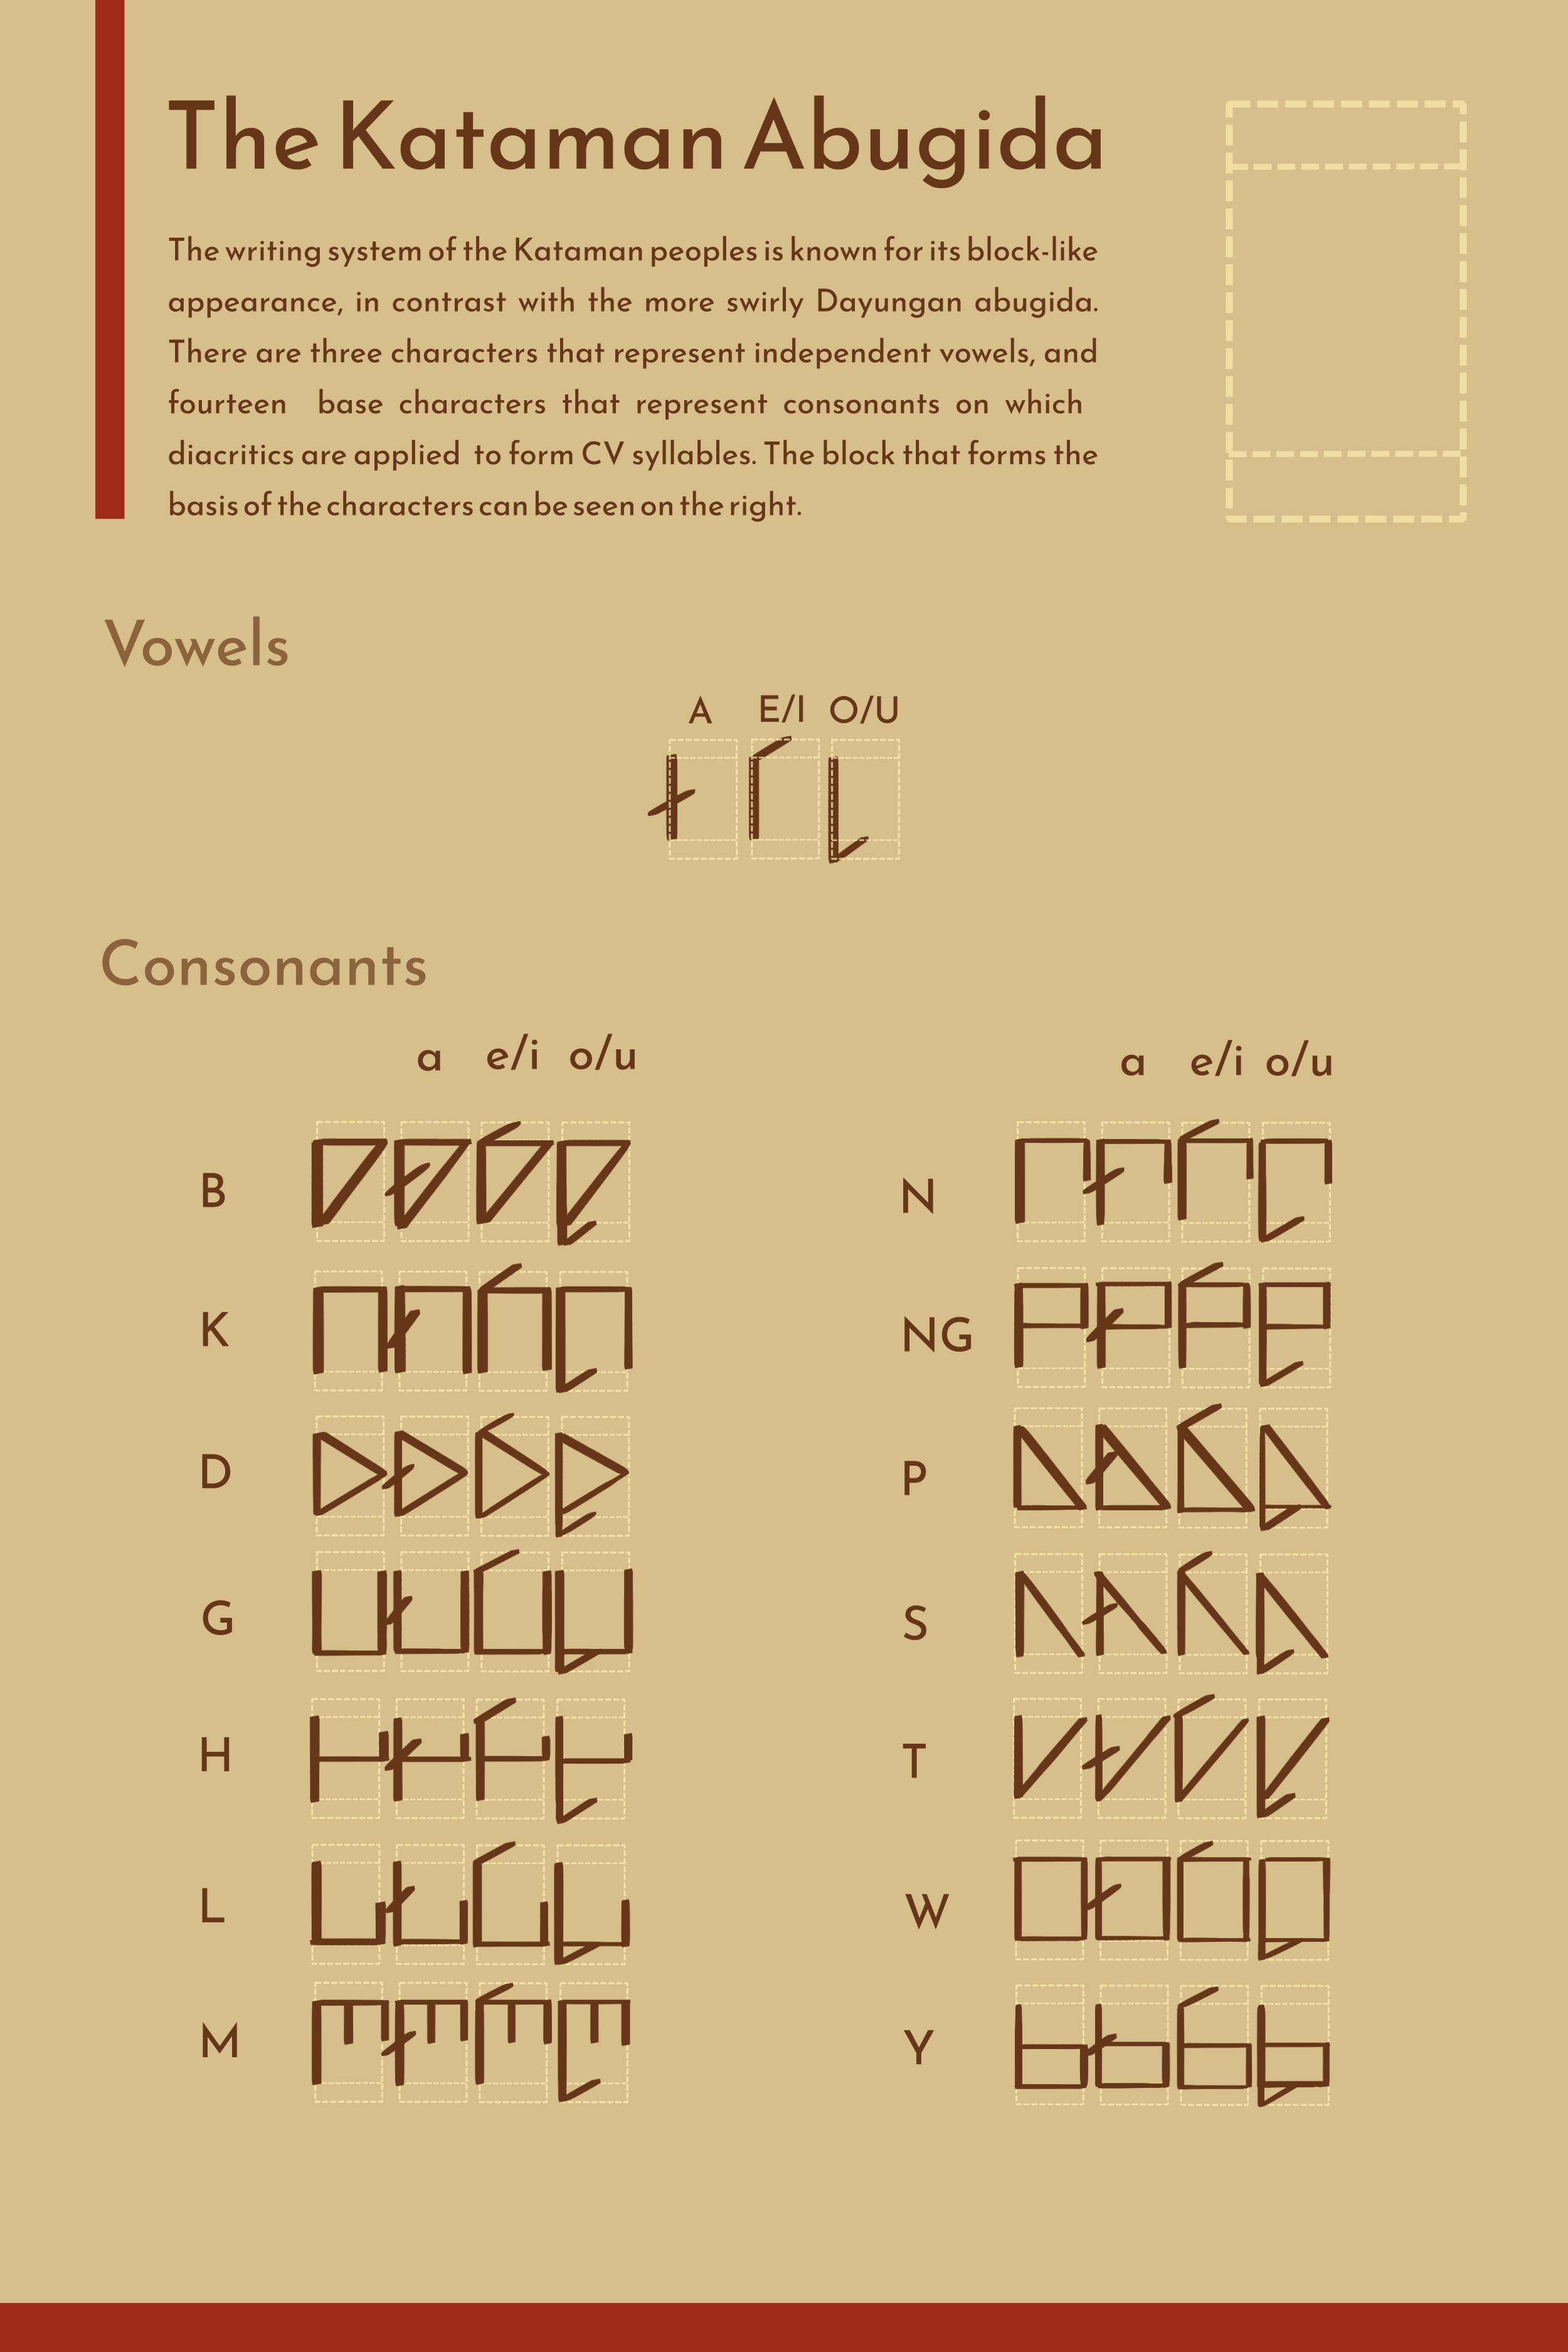 A table of the Kataman abugida and corresponding Latin alphabets